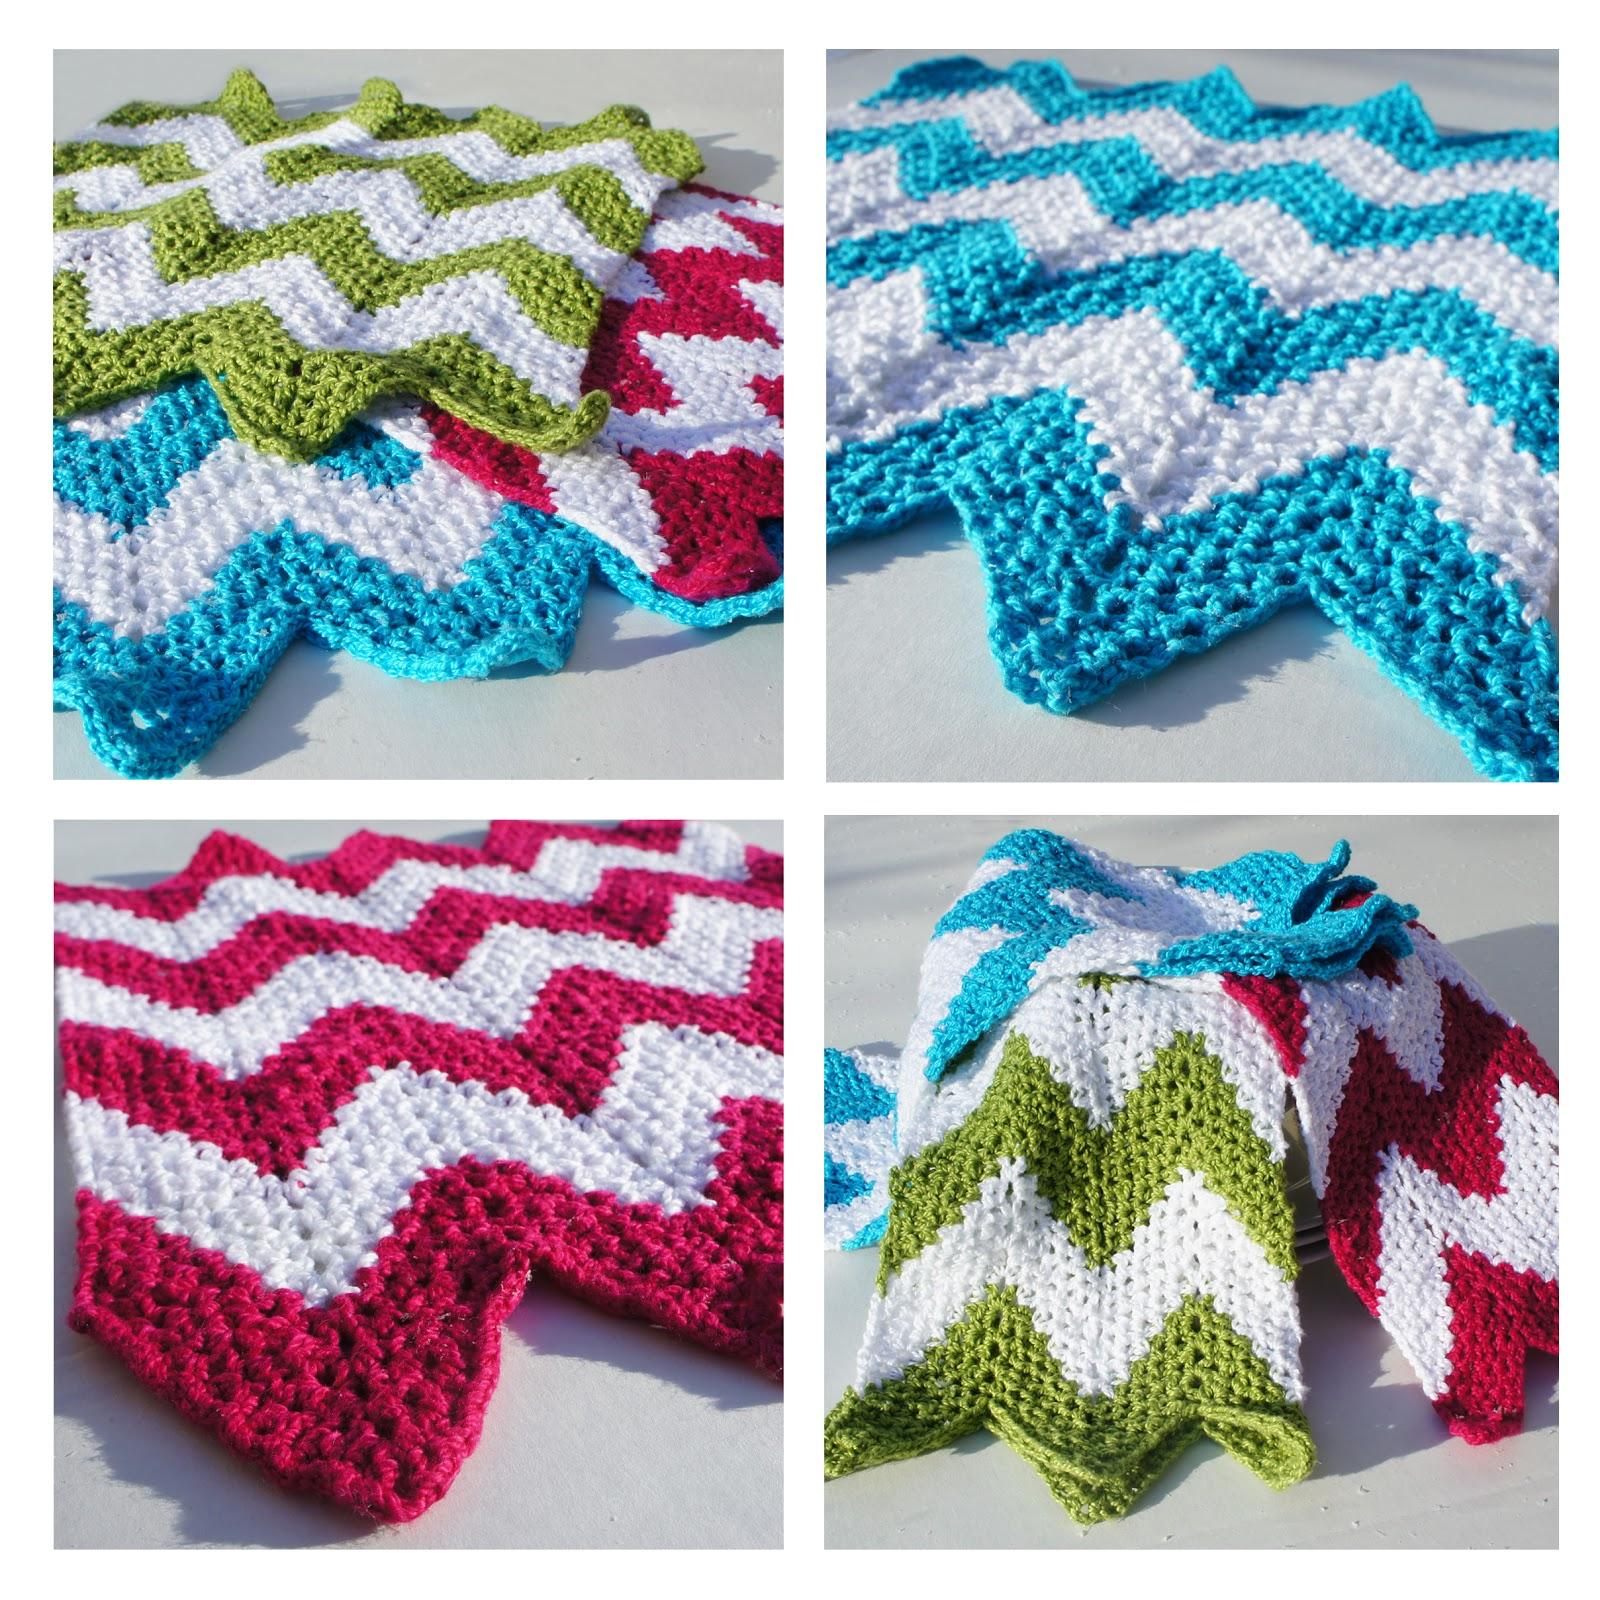 knot•sew•cute design shop: new crochet pattern - chevron dishcloths ...